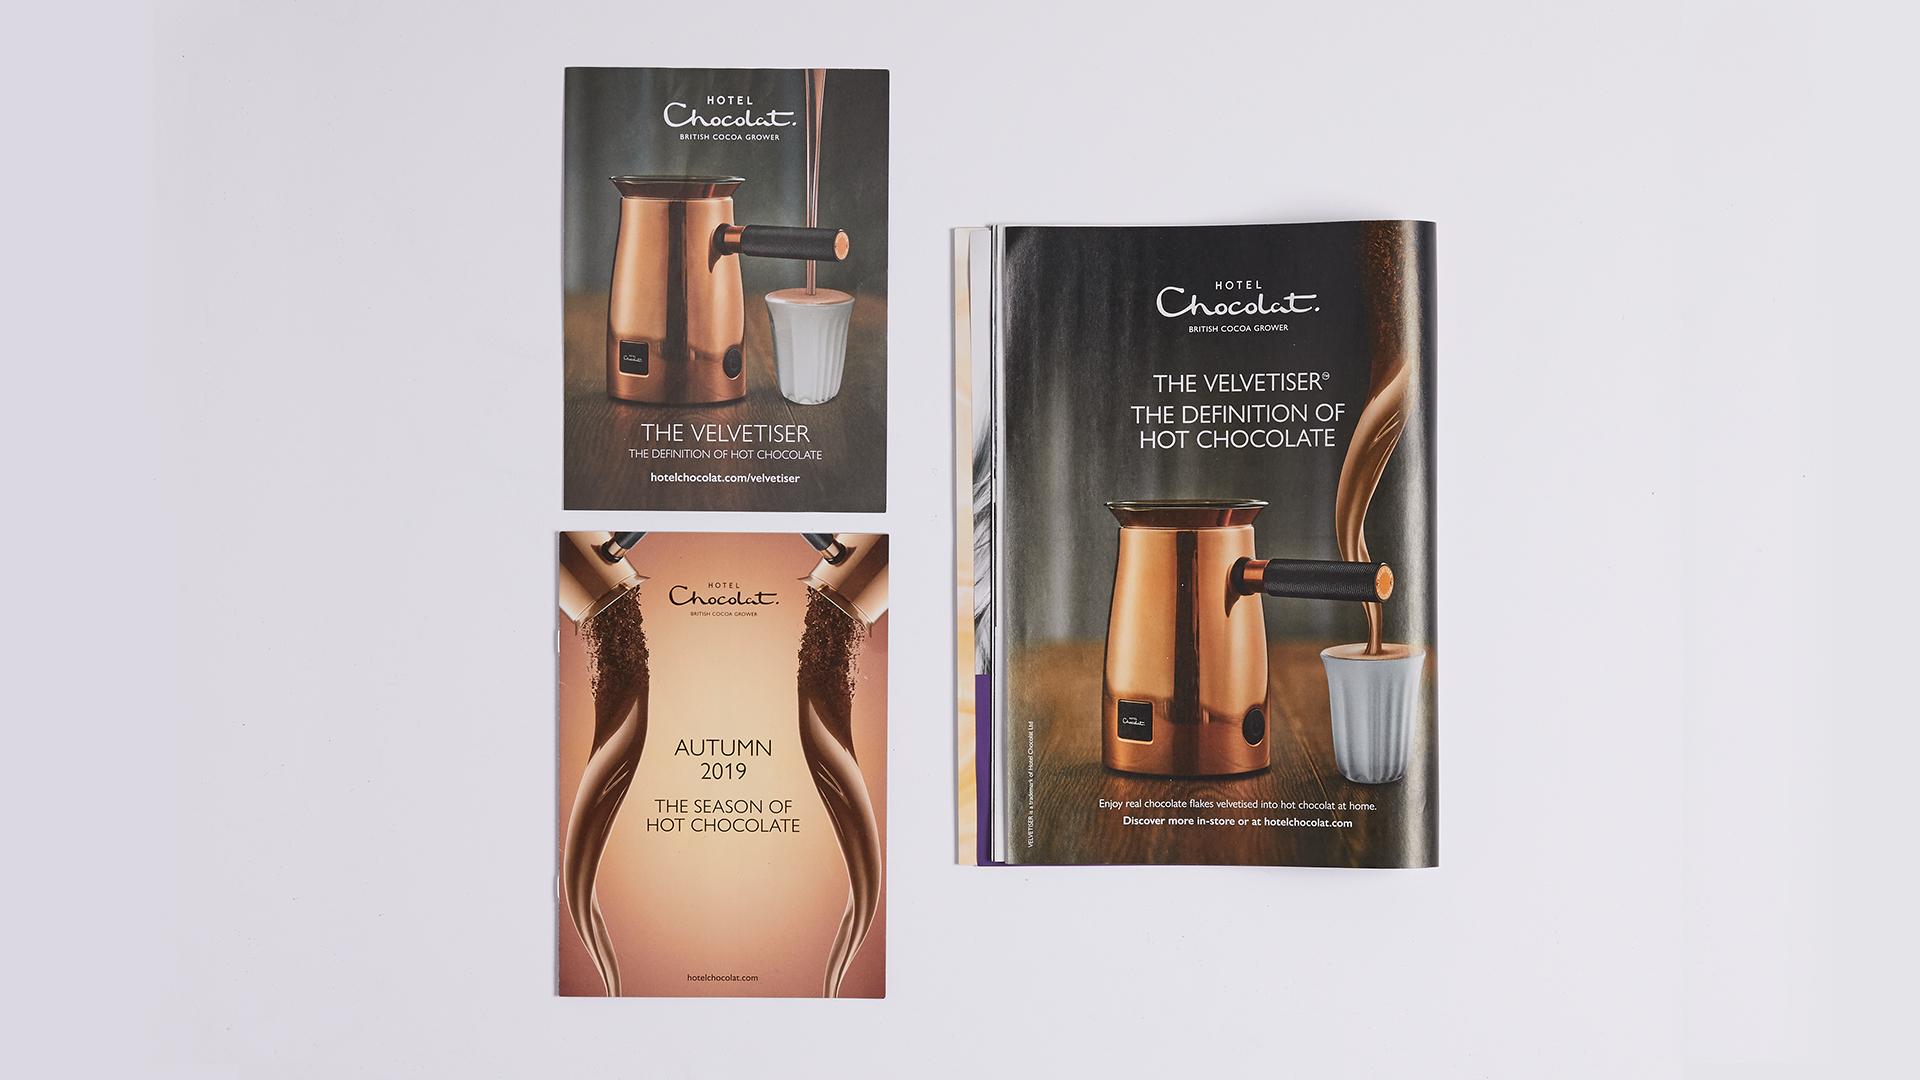 press-ad-hotel-chocolat-photography-drink